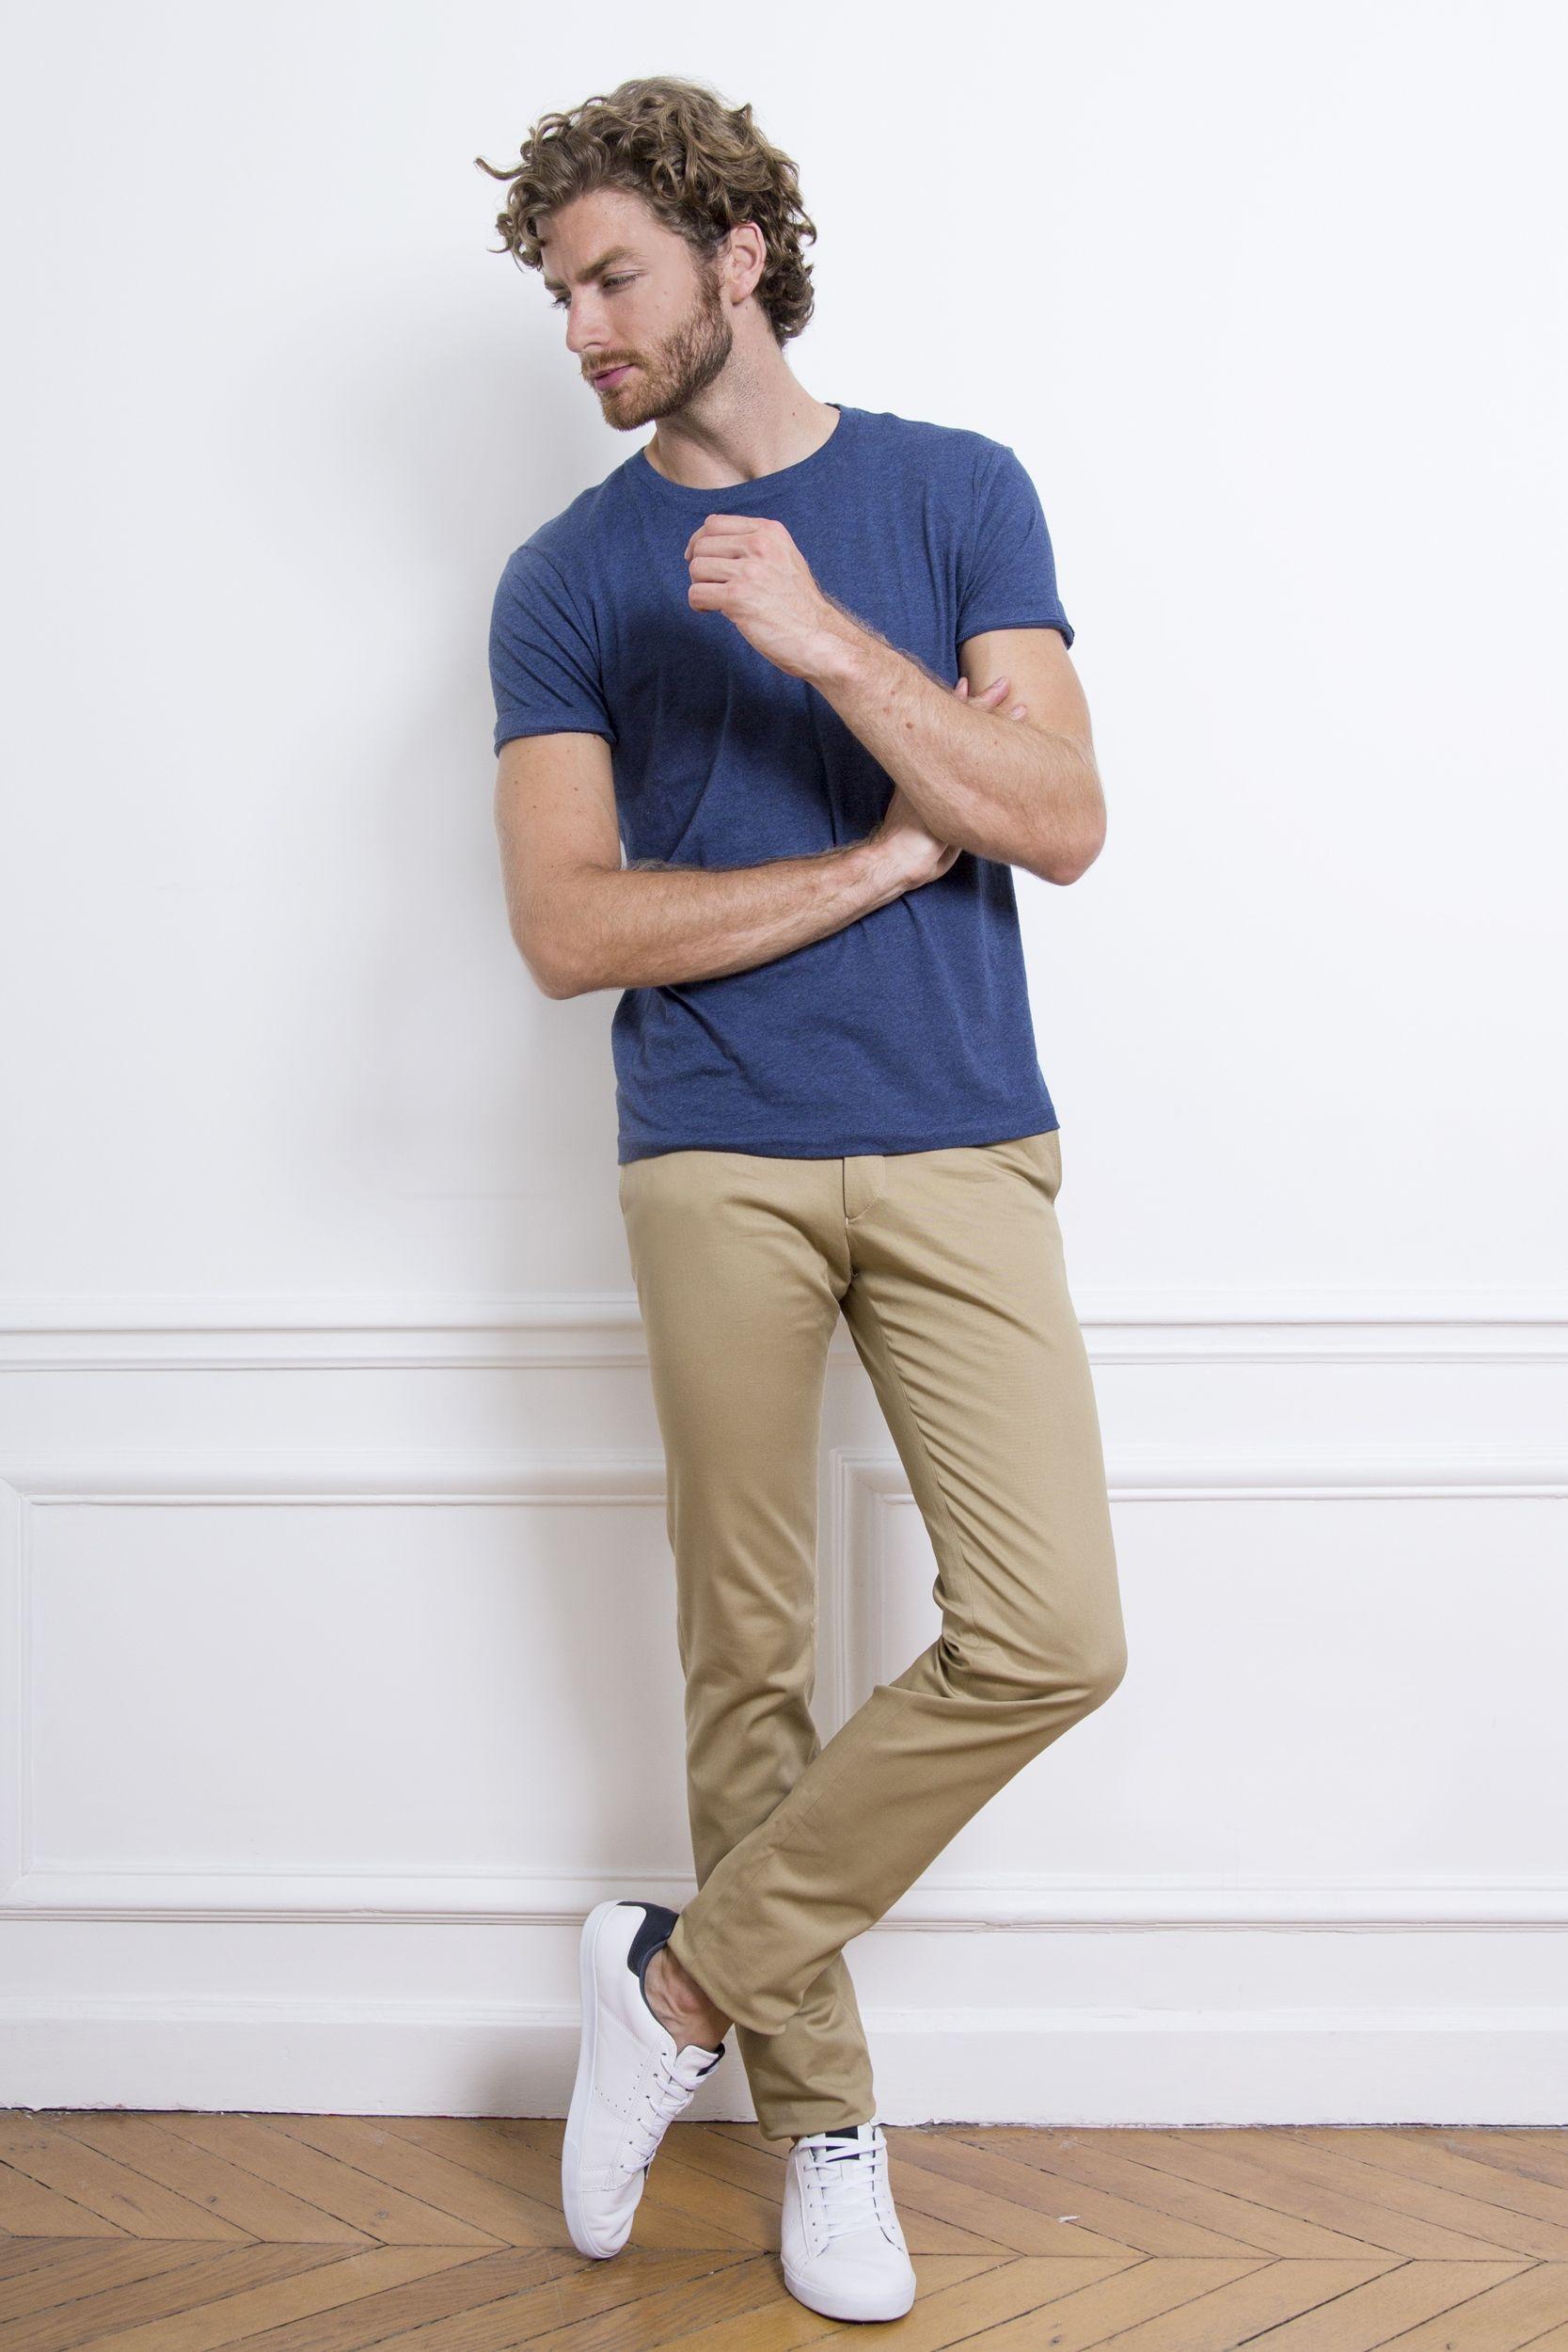 Pantalon chino beige | Vêtements homme, Mode